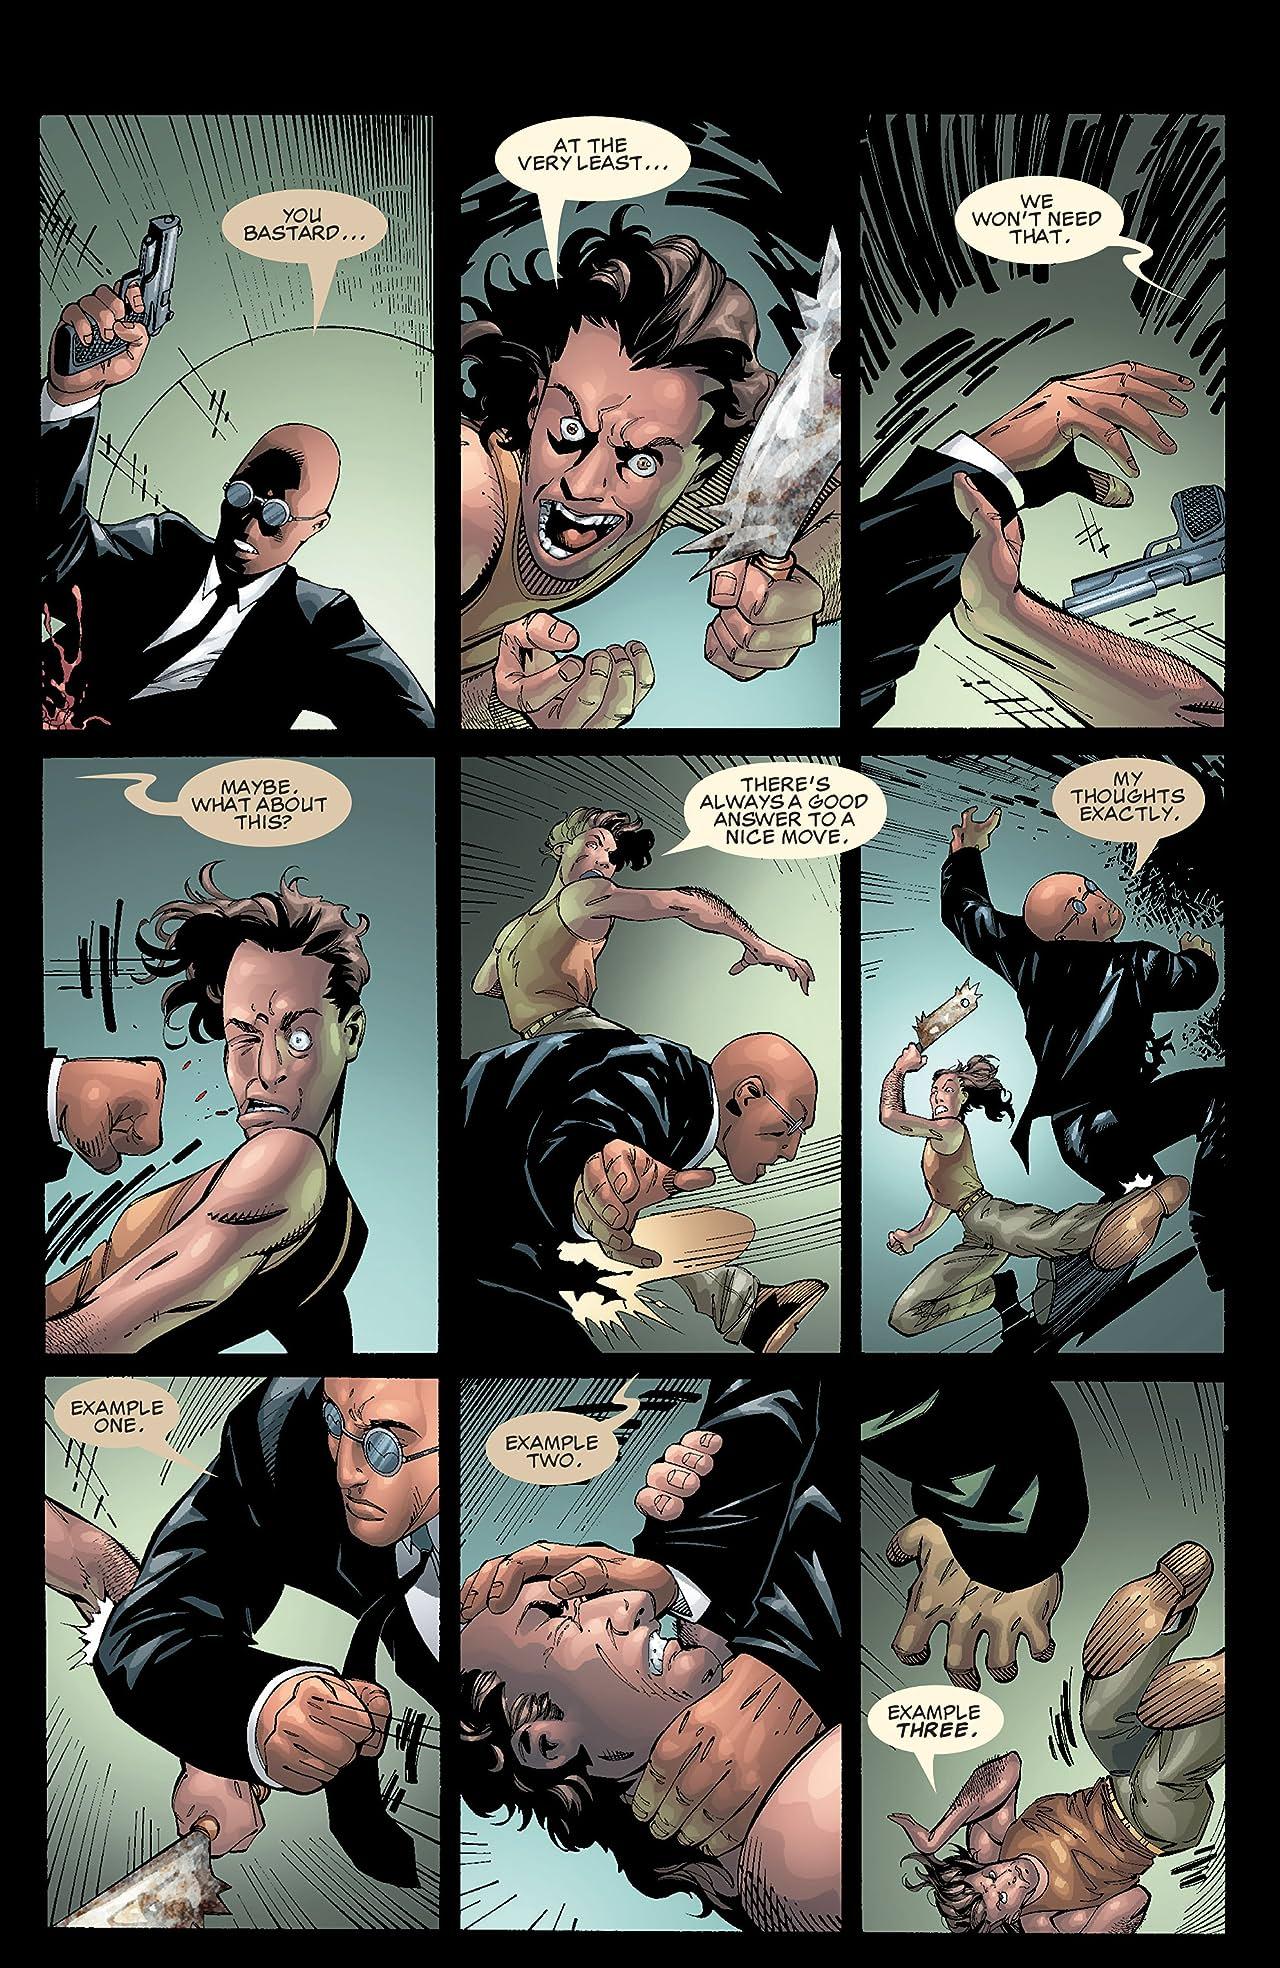 Shadowman (1999) #4